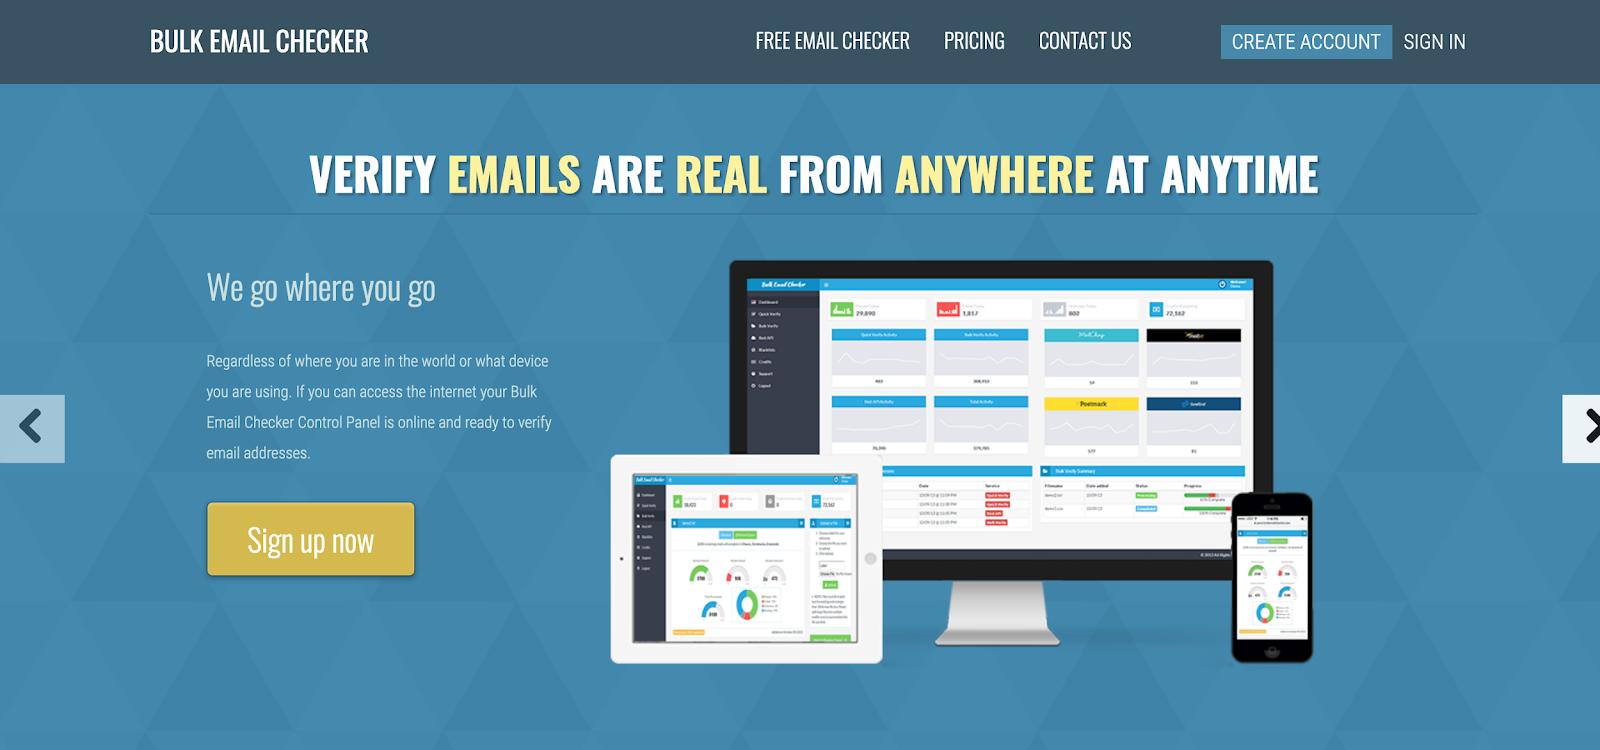 Bulk email checker